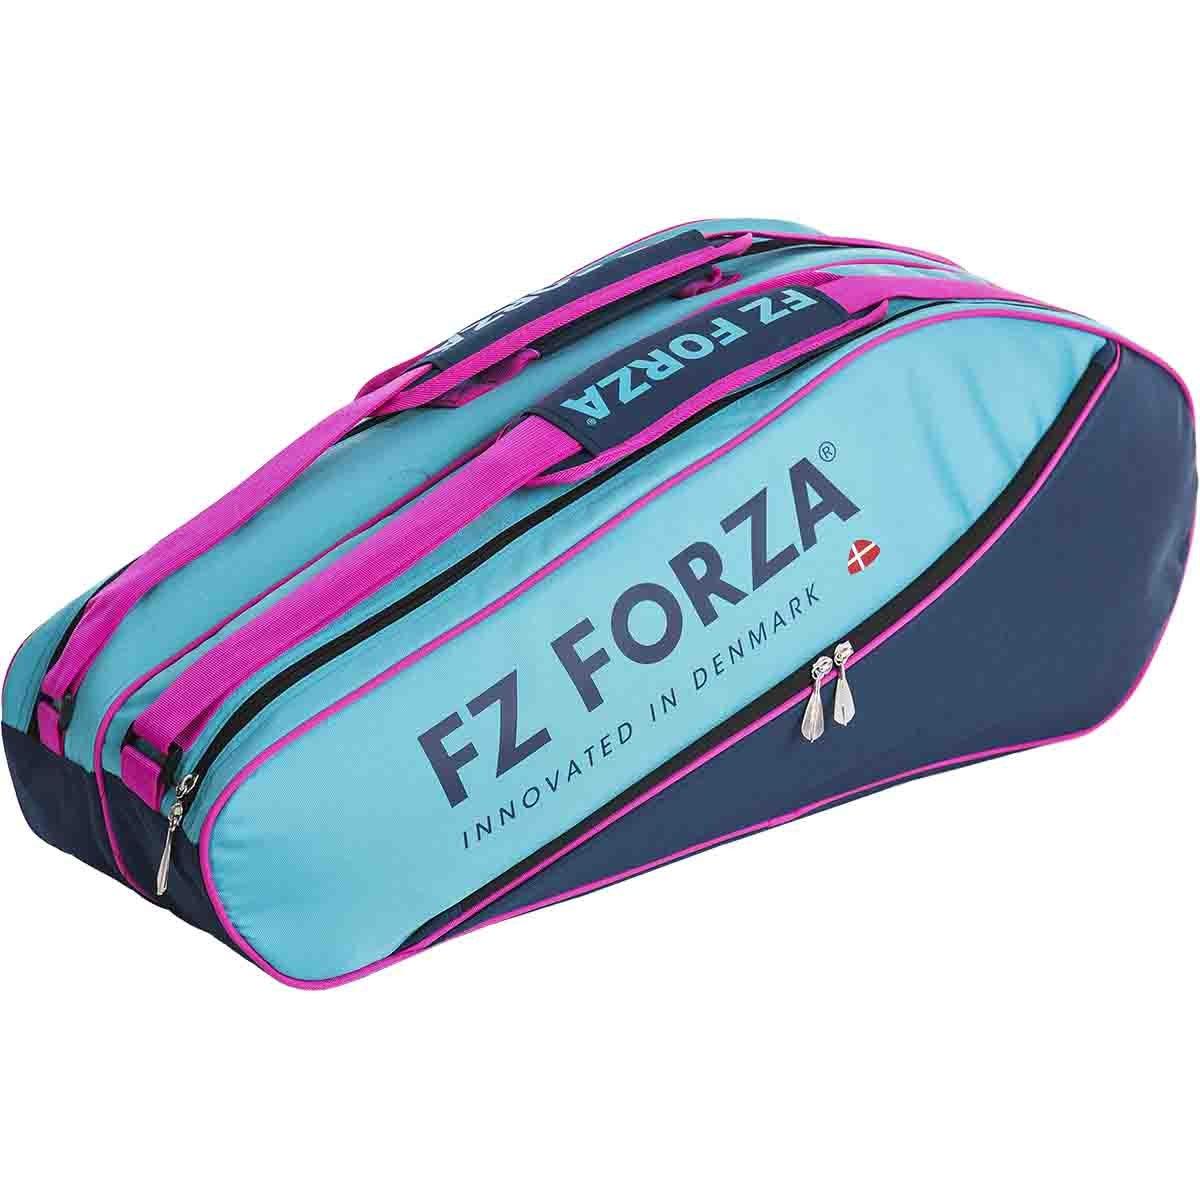 Køb Forza Linn Badmintontaske